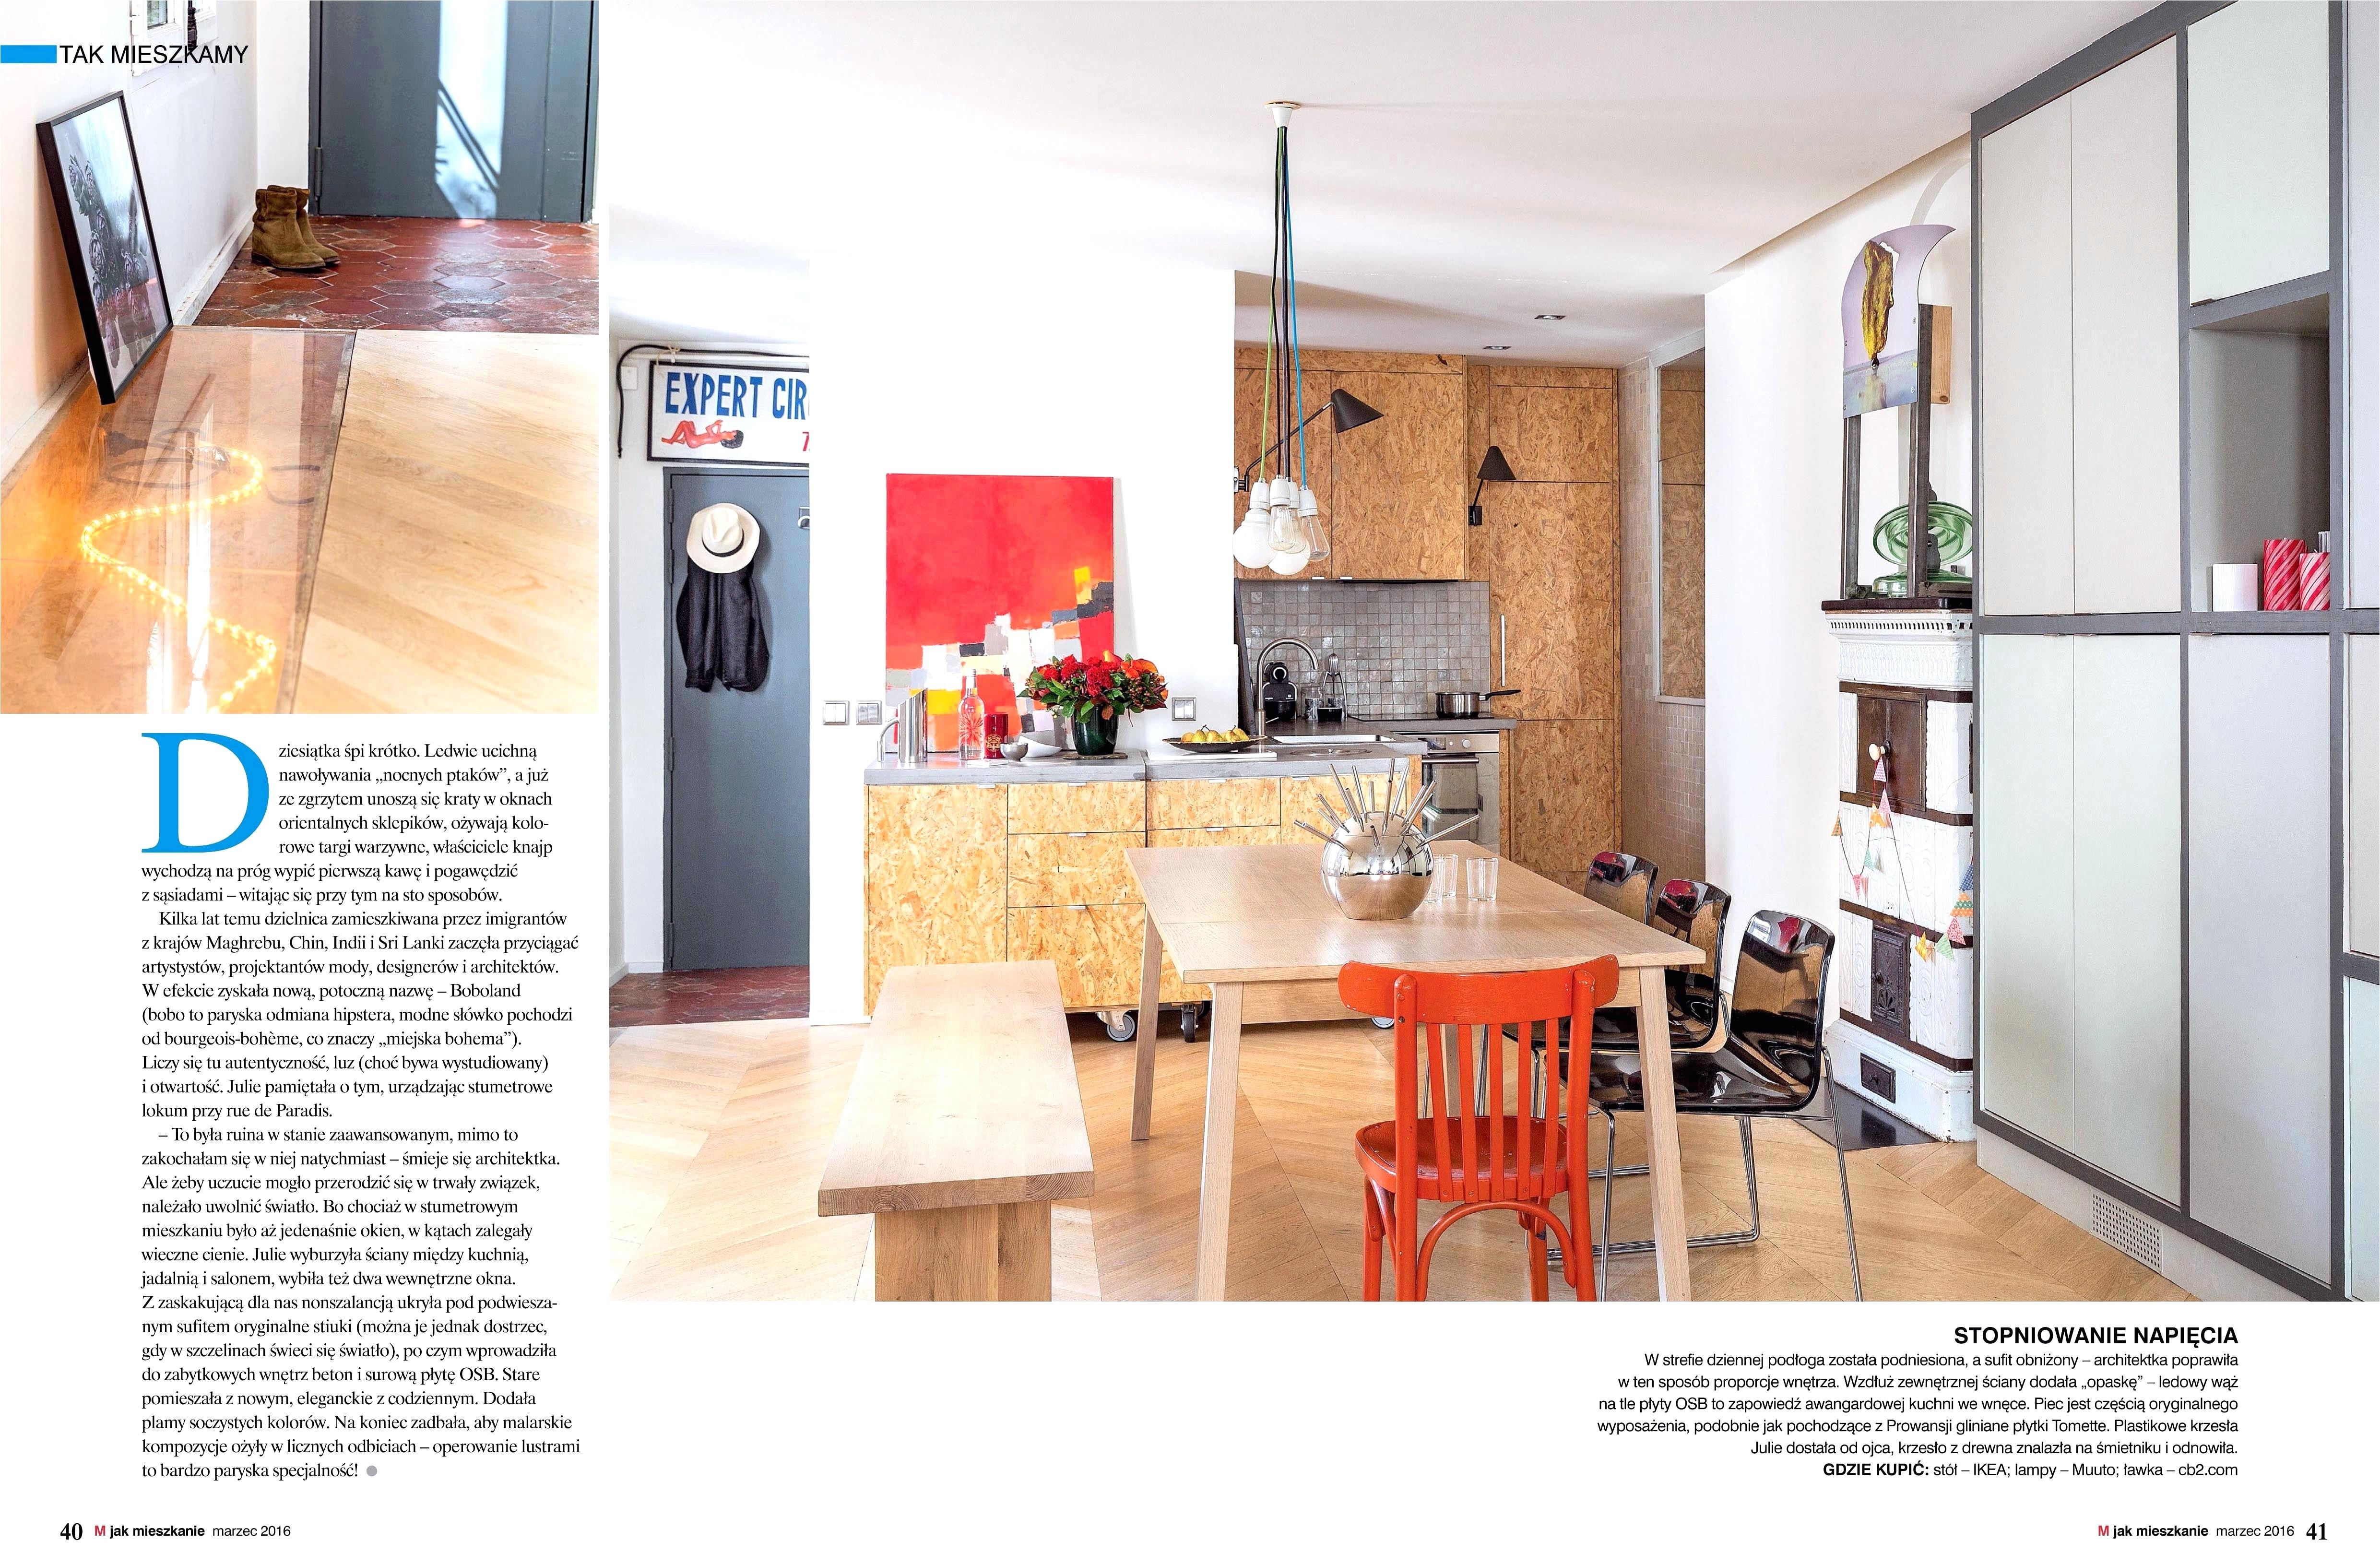 ikea pax planer line elegant ikea kitchen base cabinets new ikea kitchen designer usa unique pax